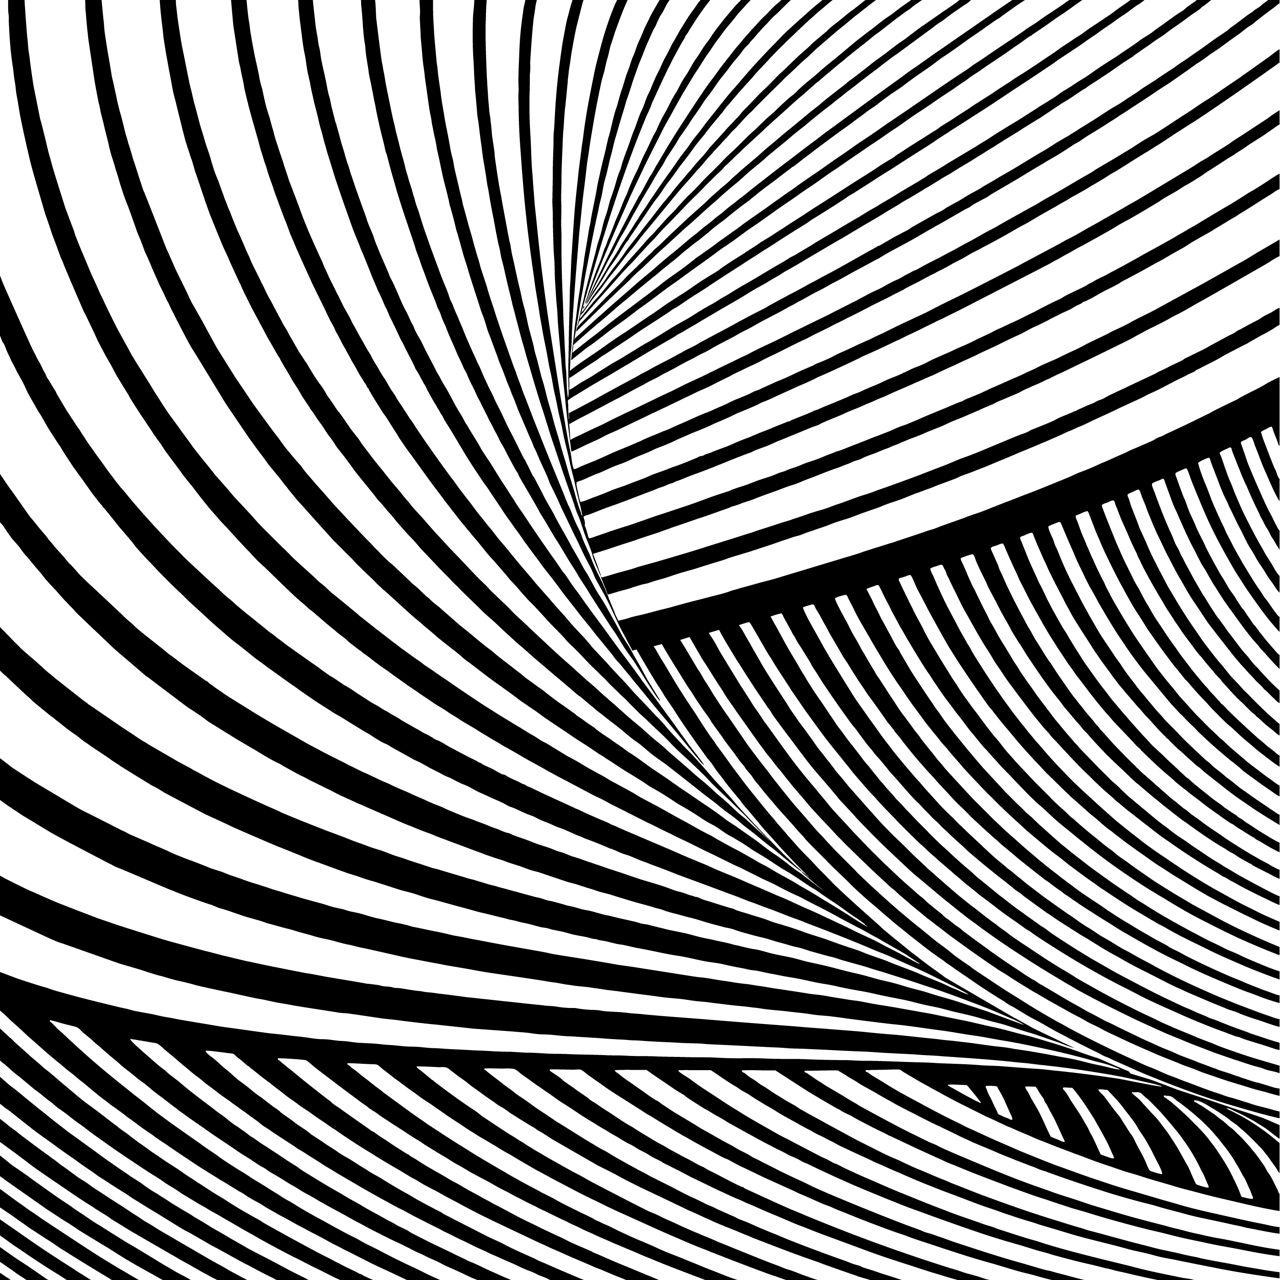 optical illusions help